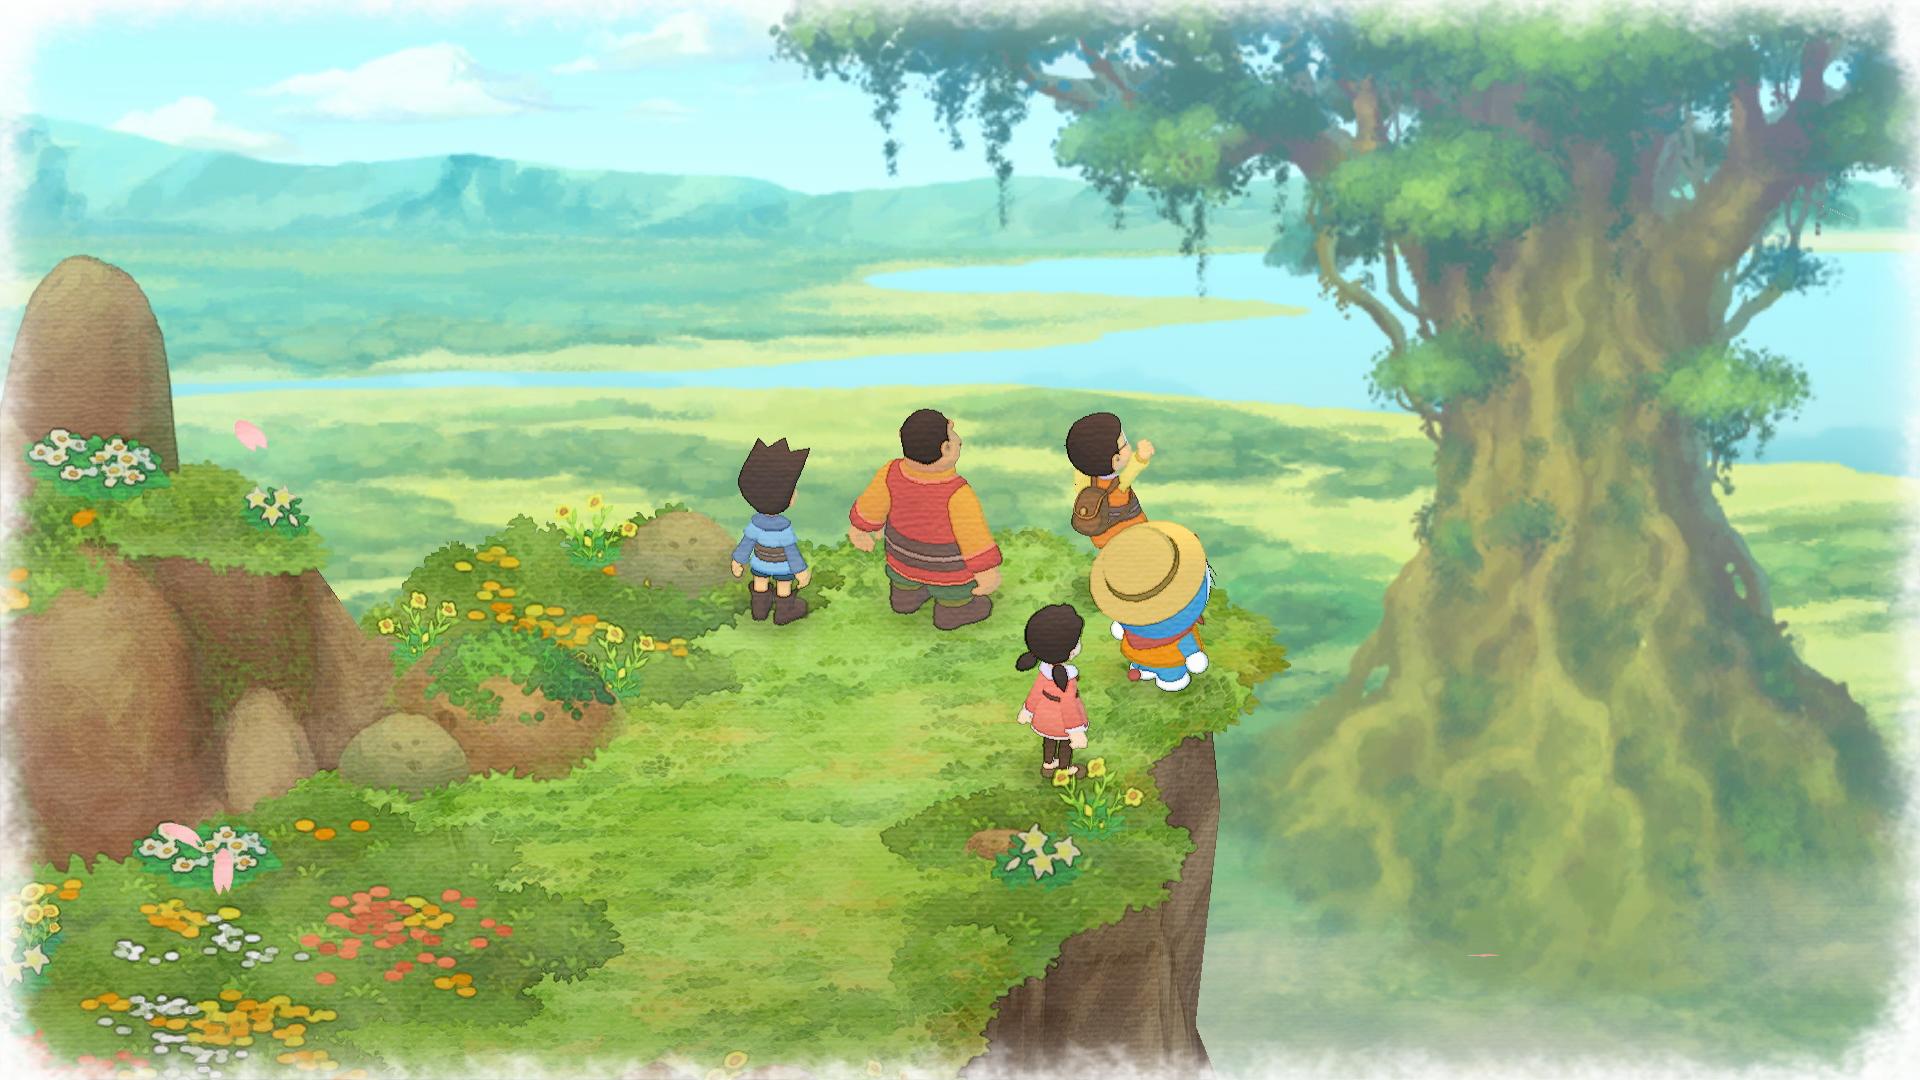 Doraemon_looking_big_tree_1556028533.png